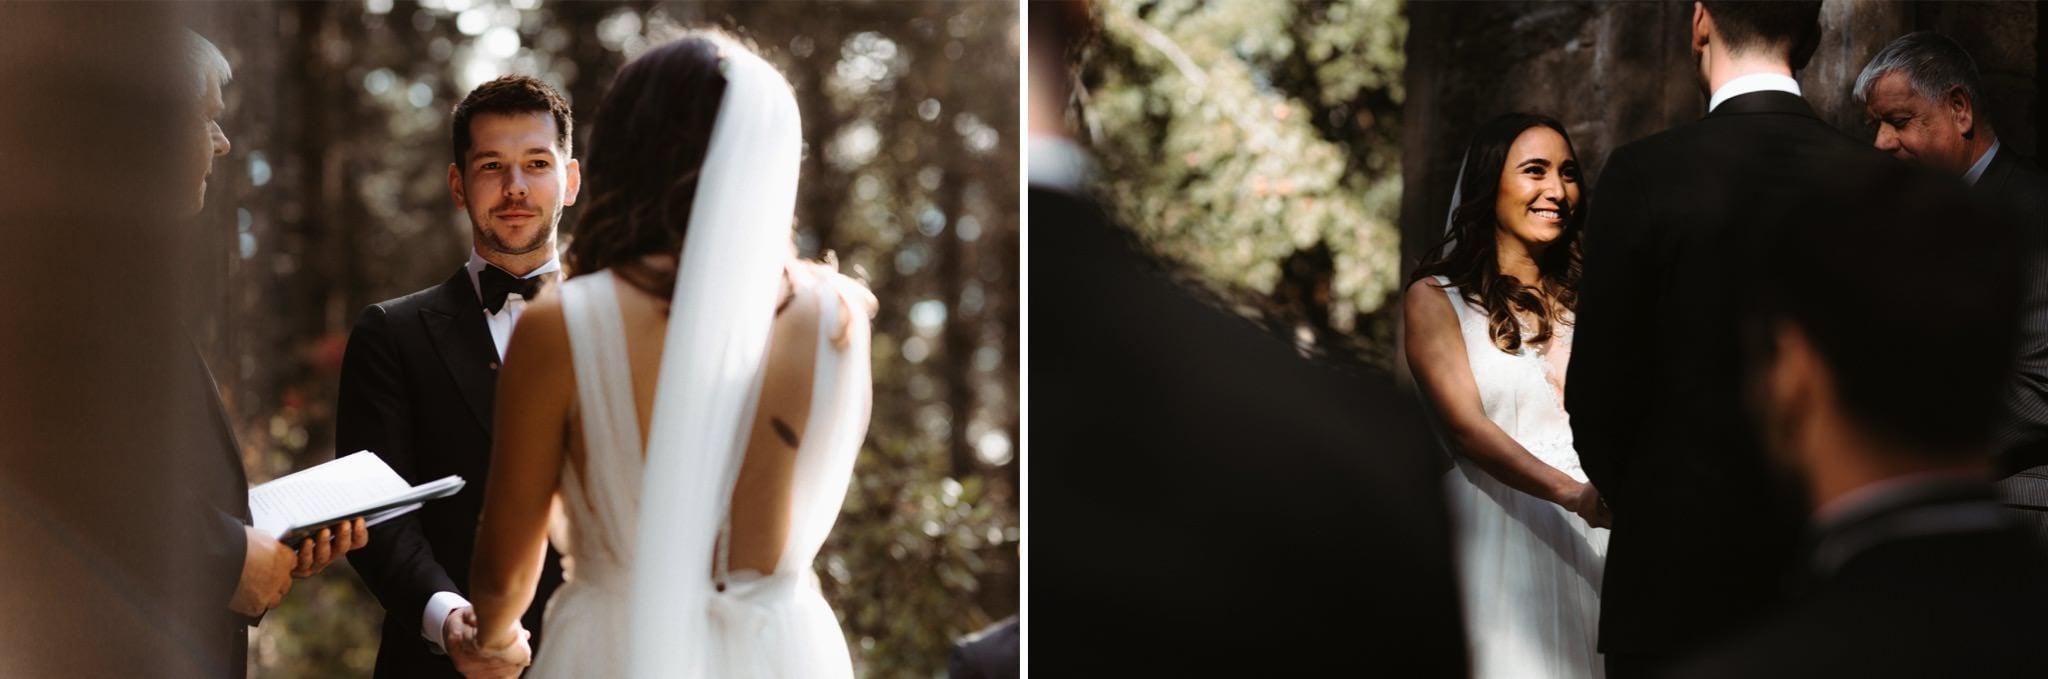 southern california wedding photographer 076